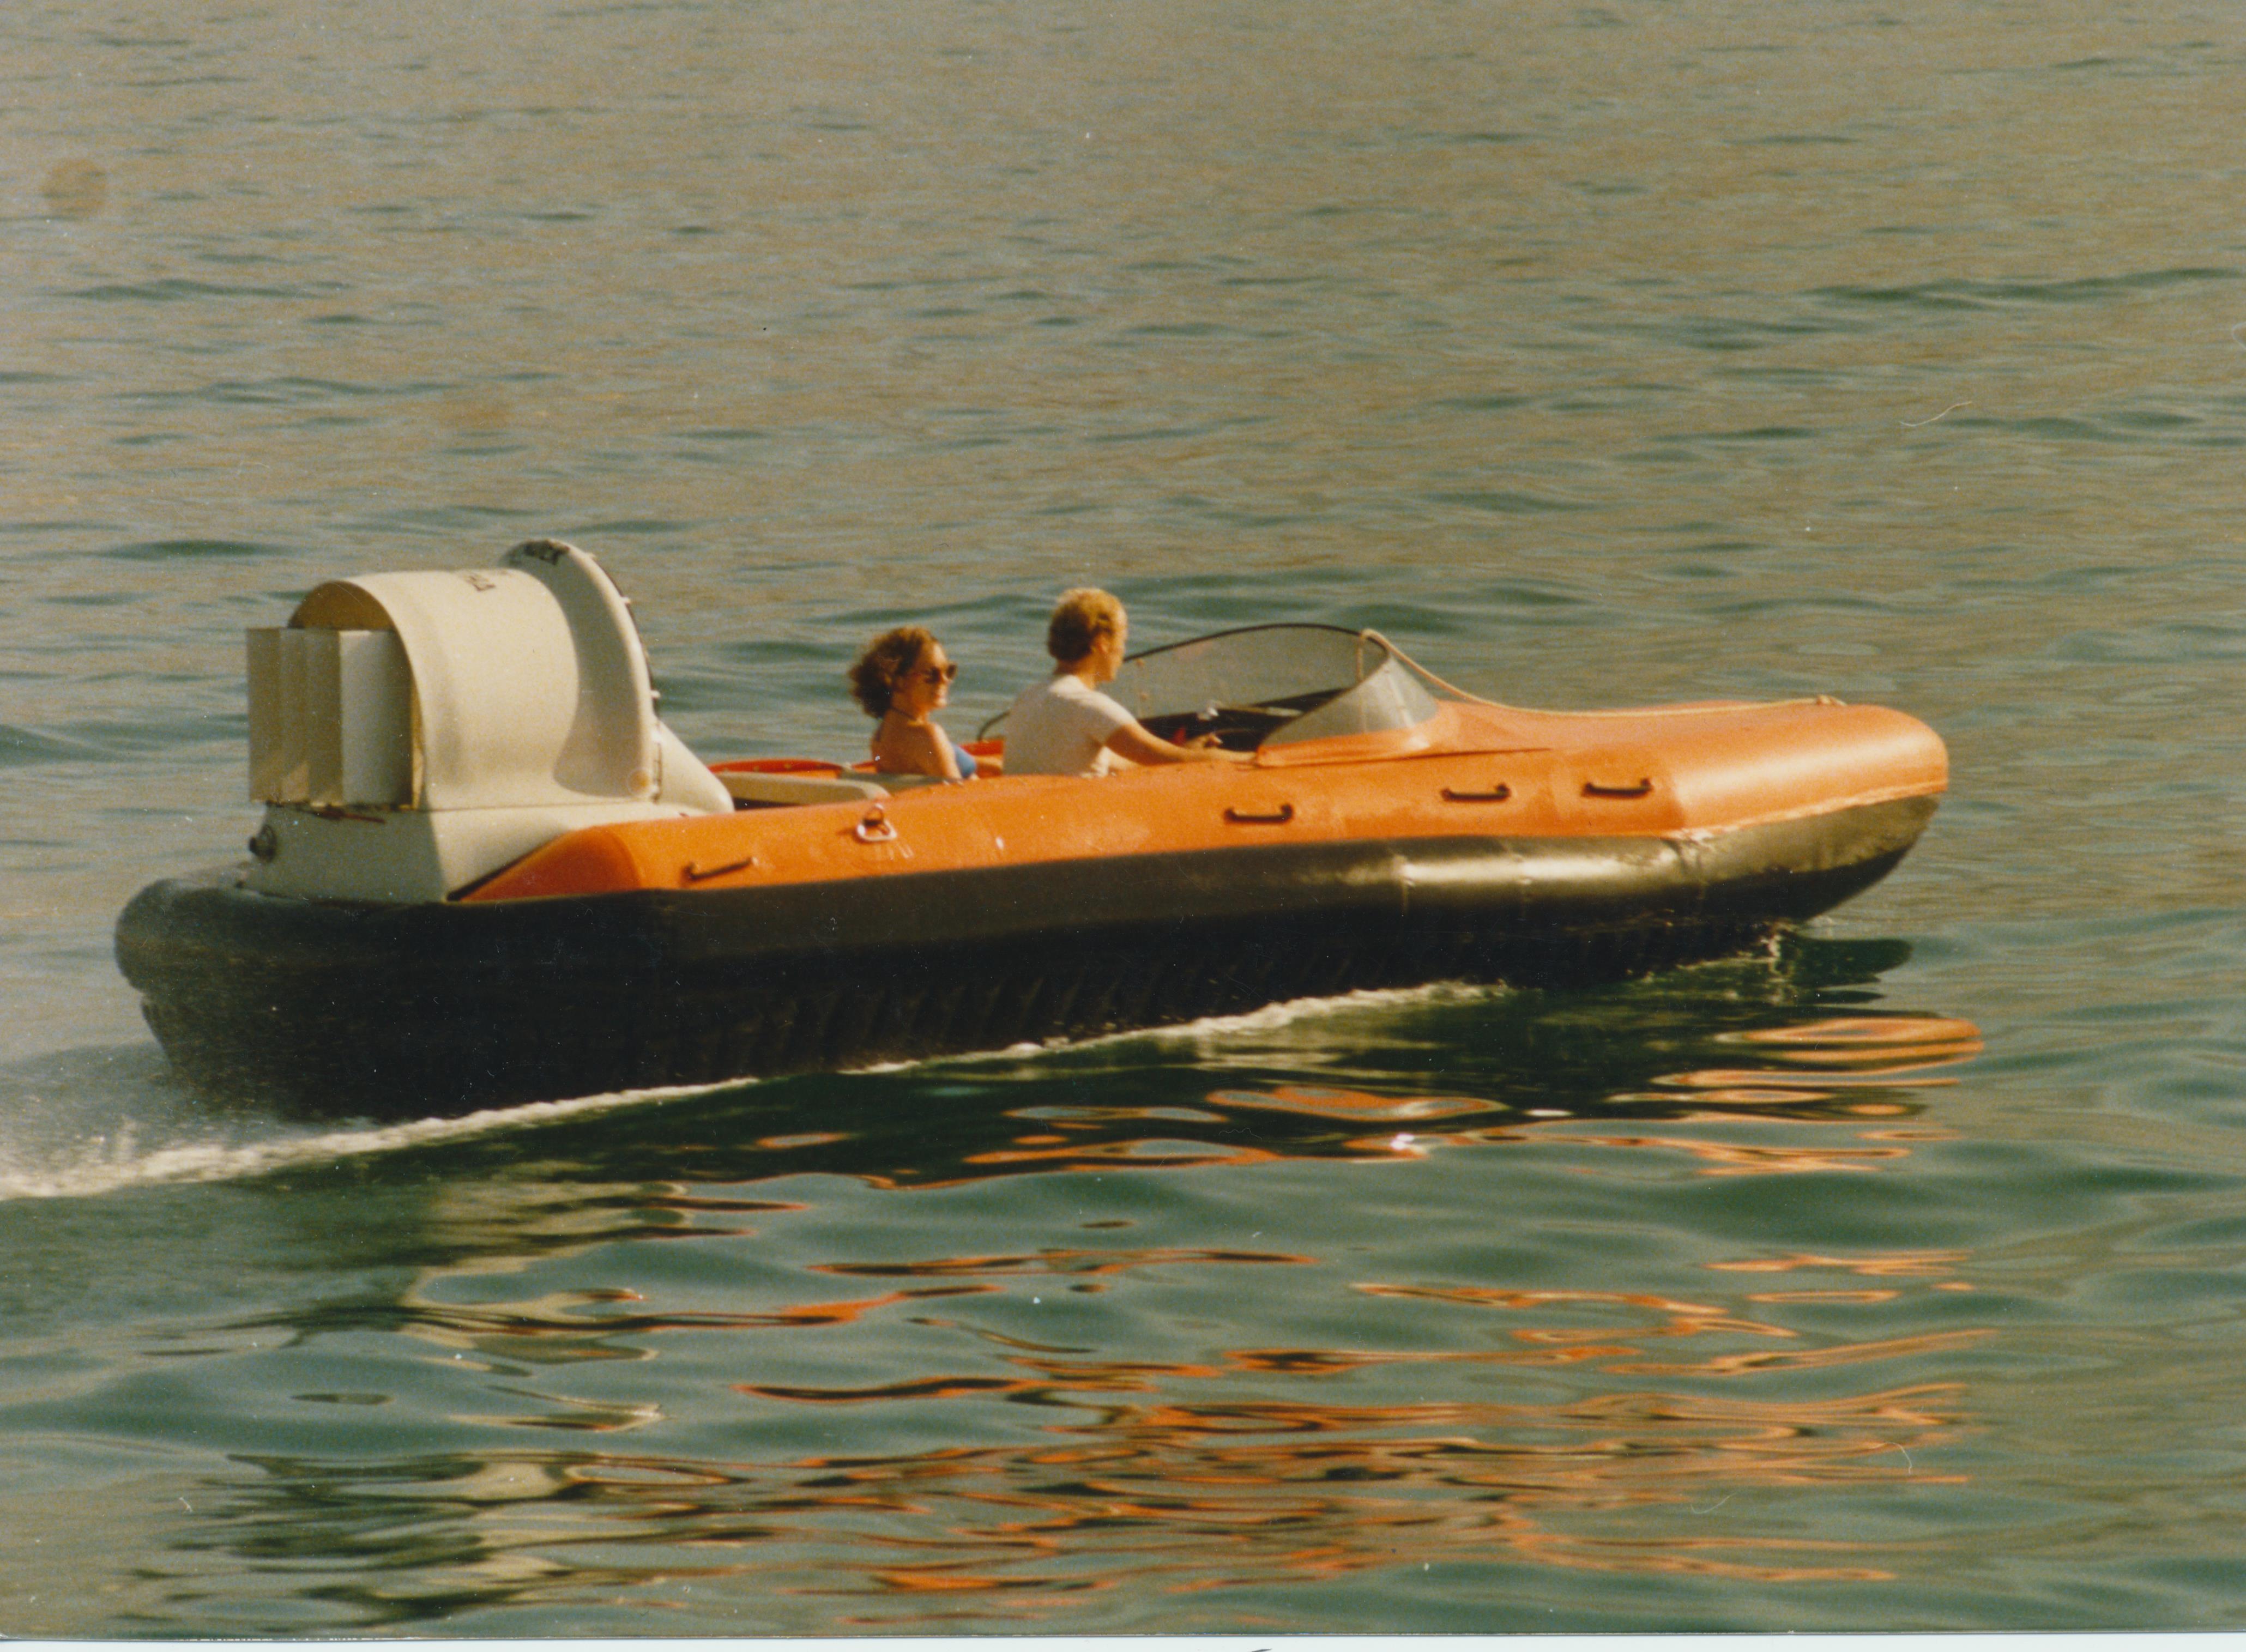 Hovercraft Travel Speedboat